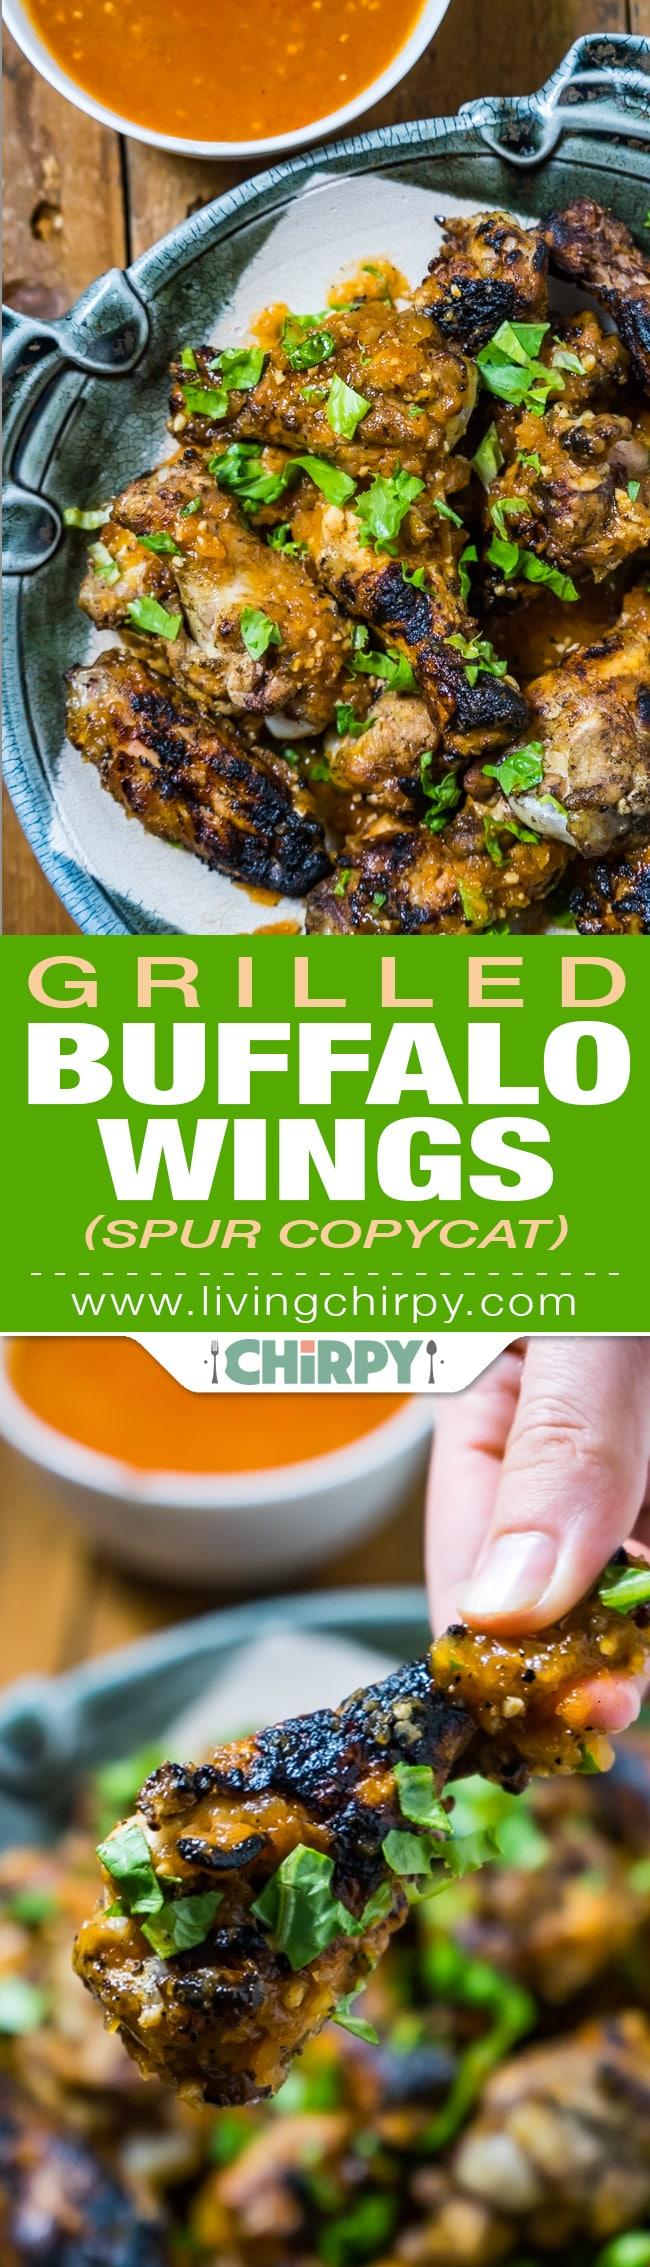 Spur Copycat Grilled Buffalo Wings